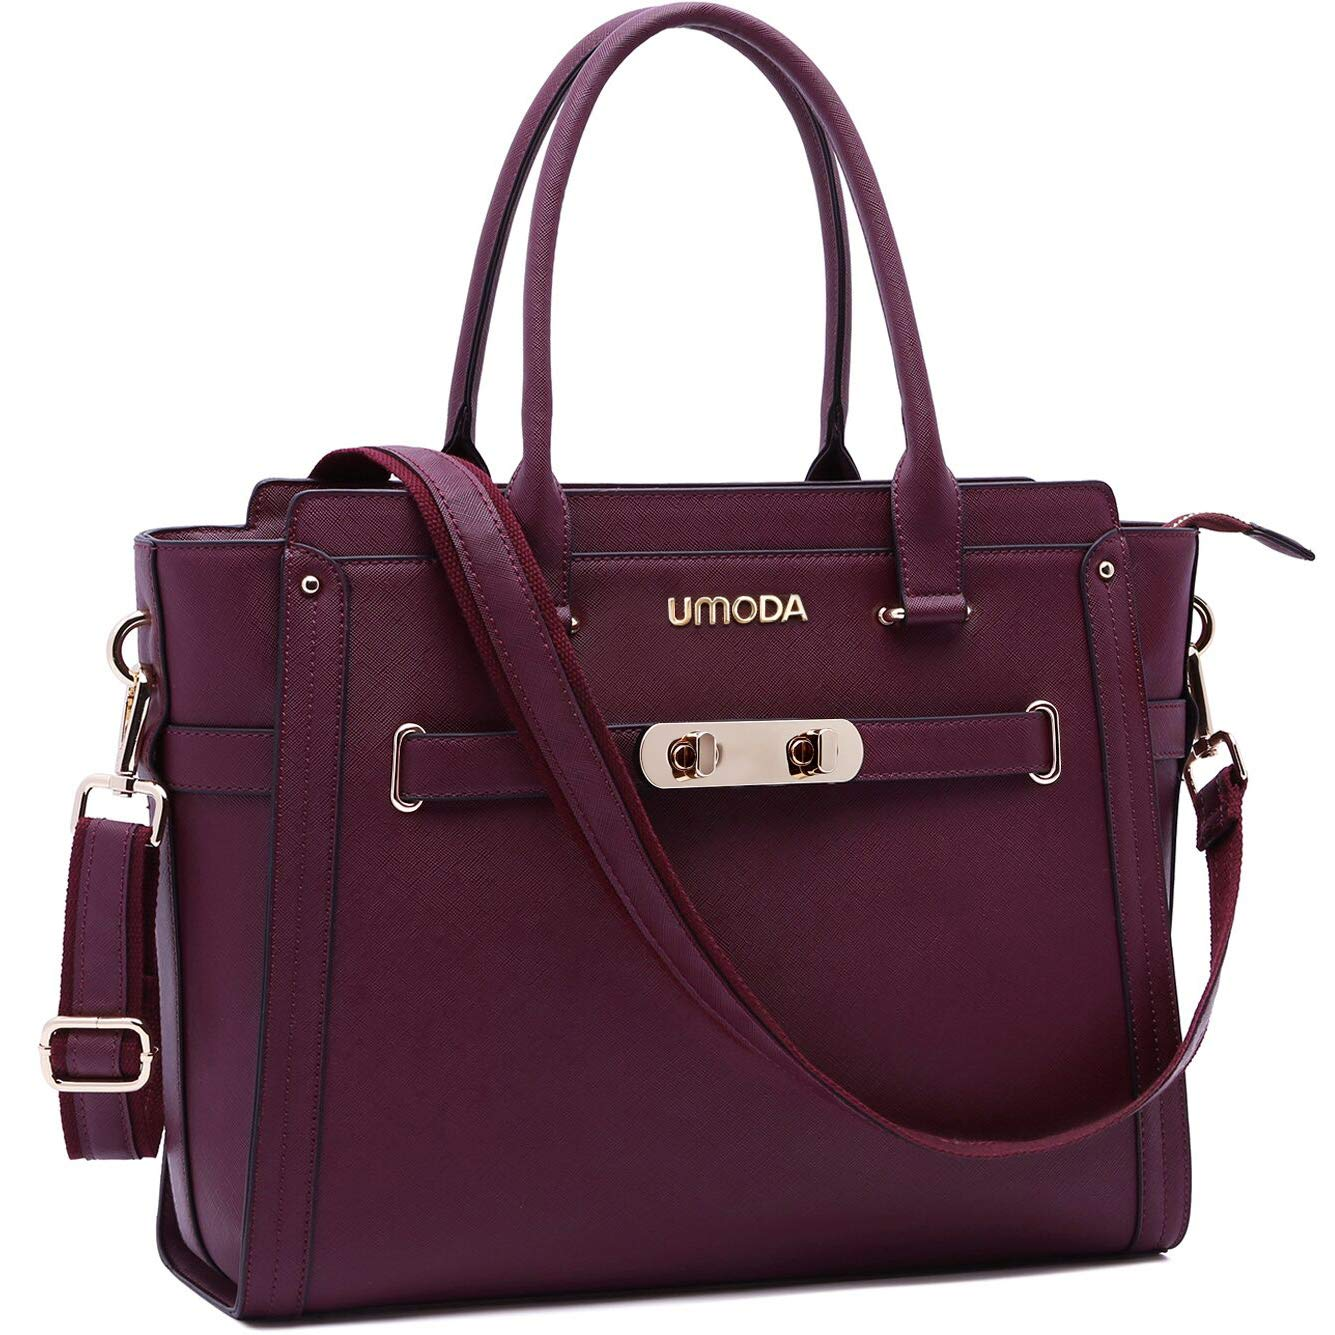 Laptop Bag for Women,15.6 Inch Multi Pocket Padded Laptop Tote Bag,Padlock Design Computer Bags for Women,Burgundy by UMODA